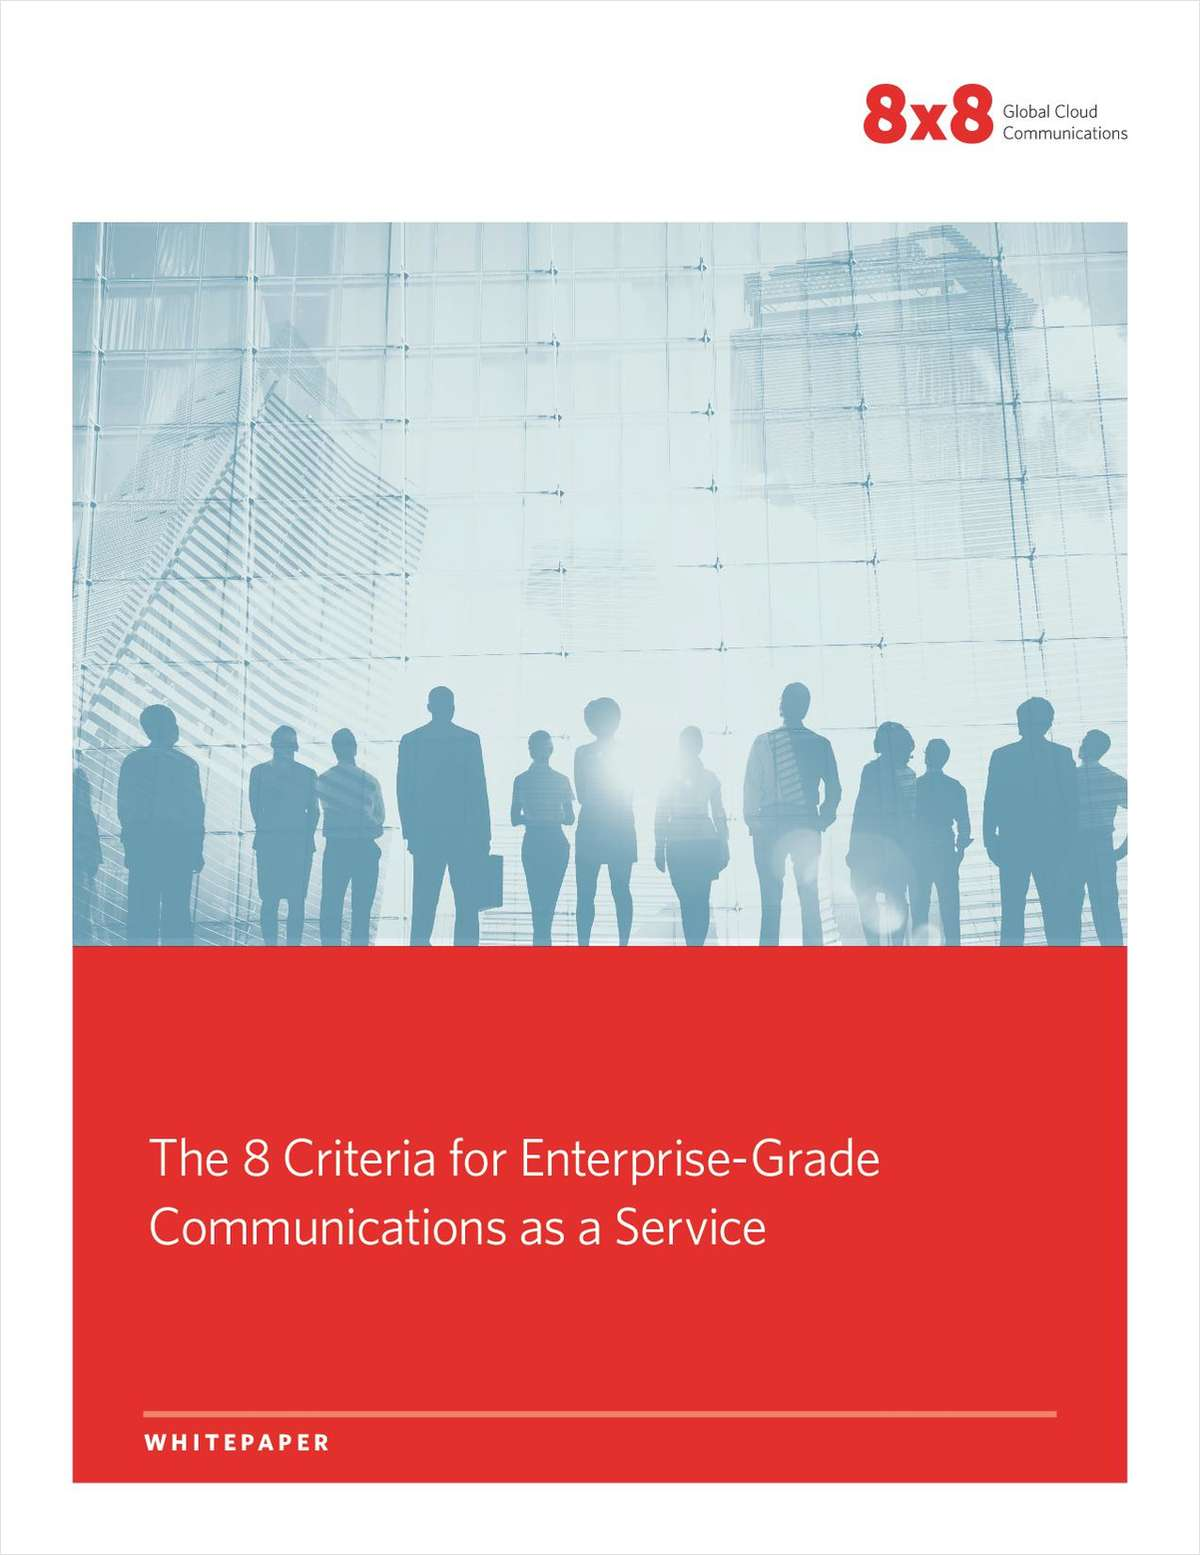 The 8 Criteria for Enterprise-Grade Communications as a Service